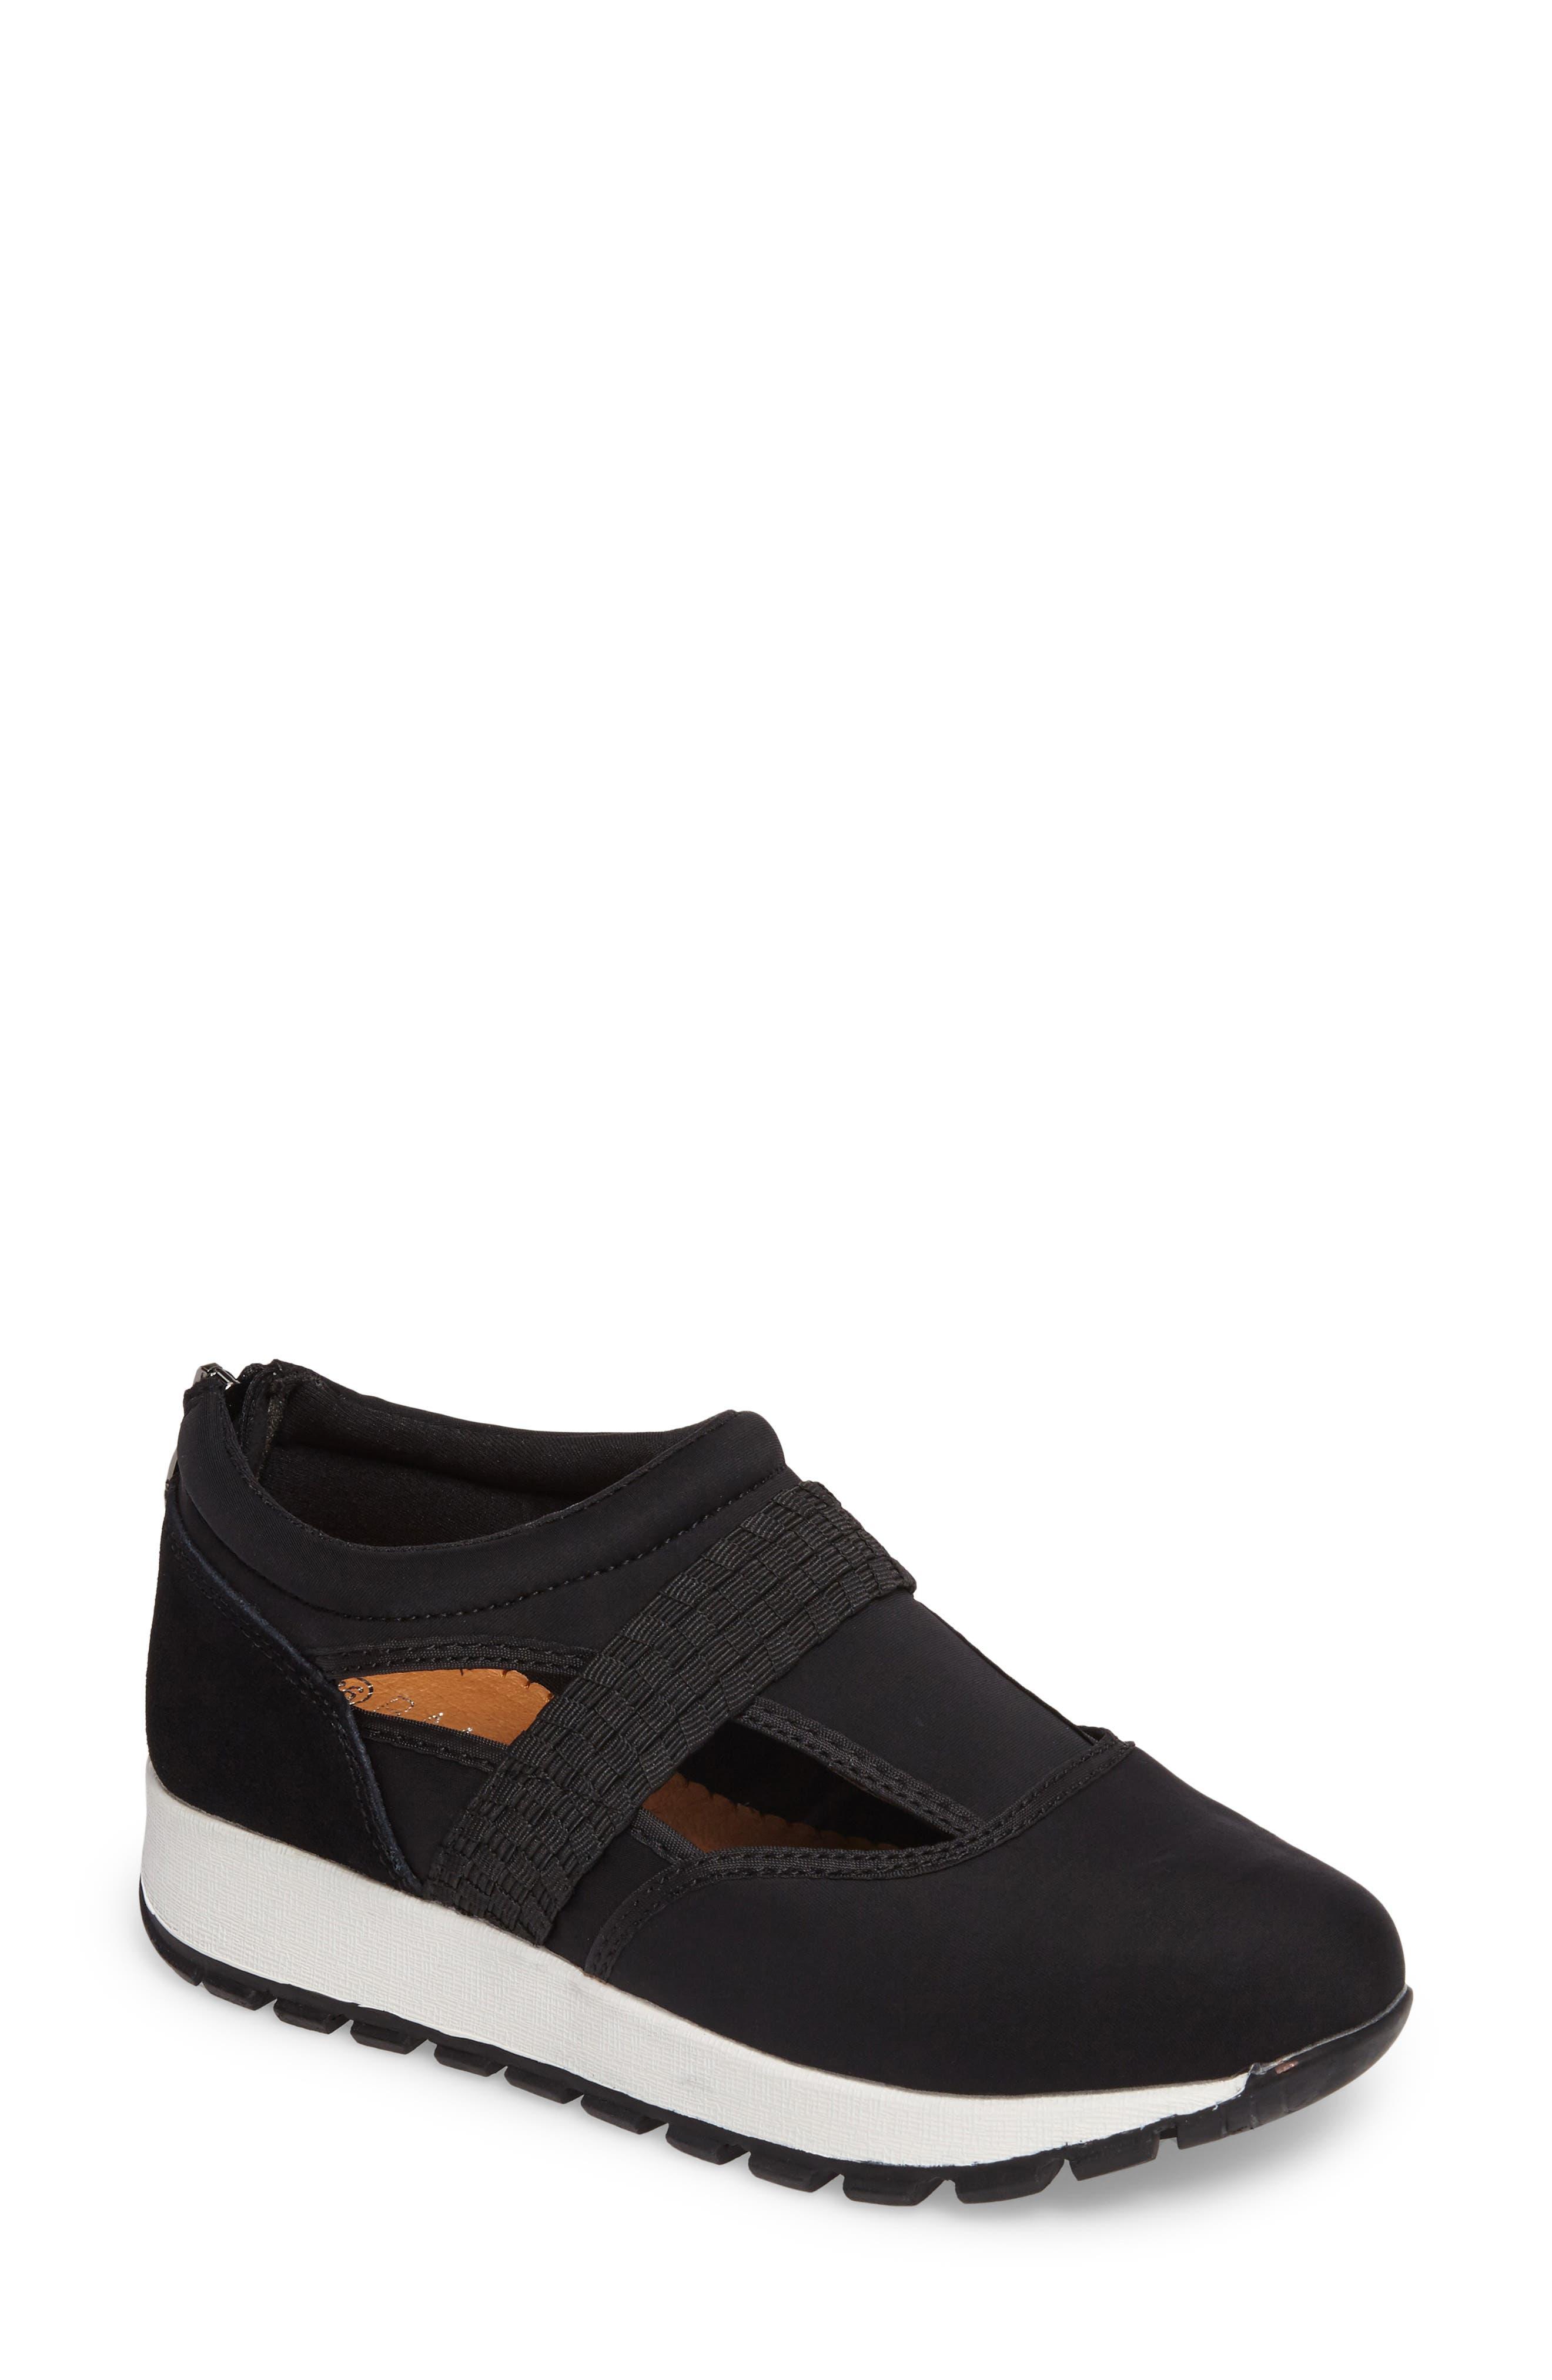 BERNIE MEV. Bernie Mev Janelle Sneaker, Main, color, BLACK FABRIC